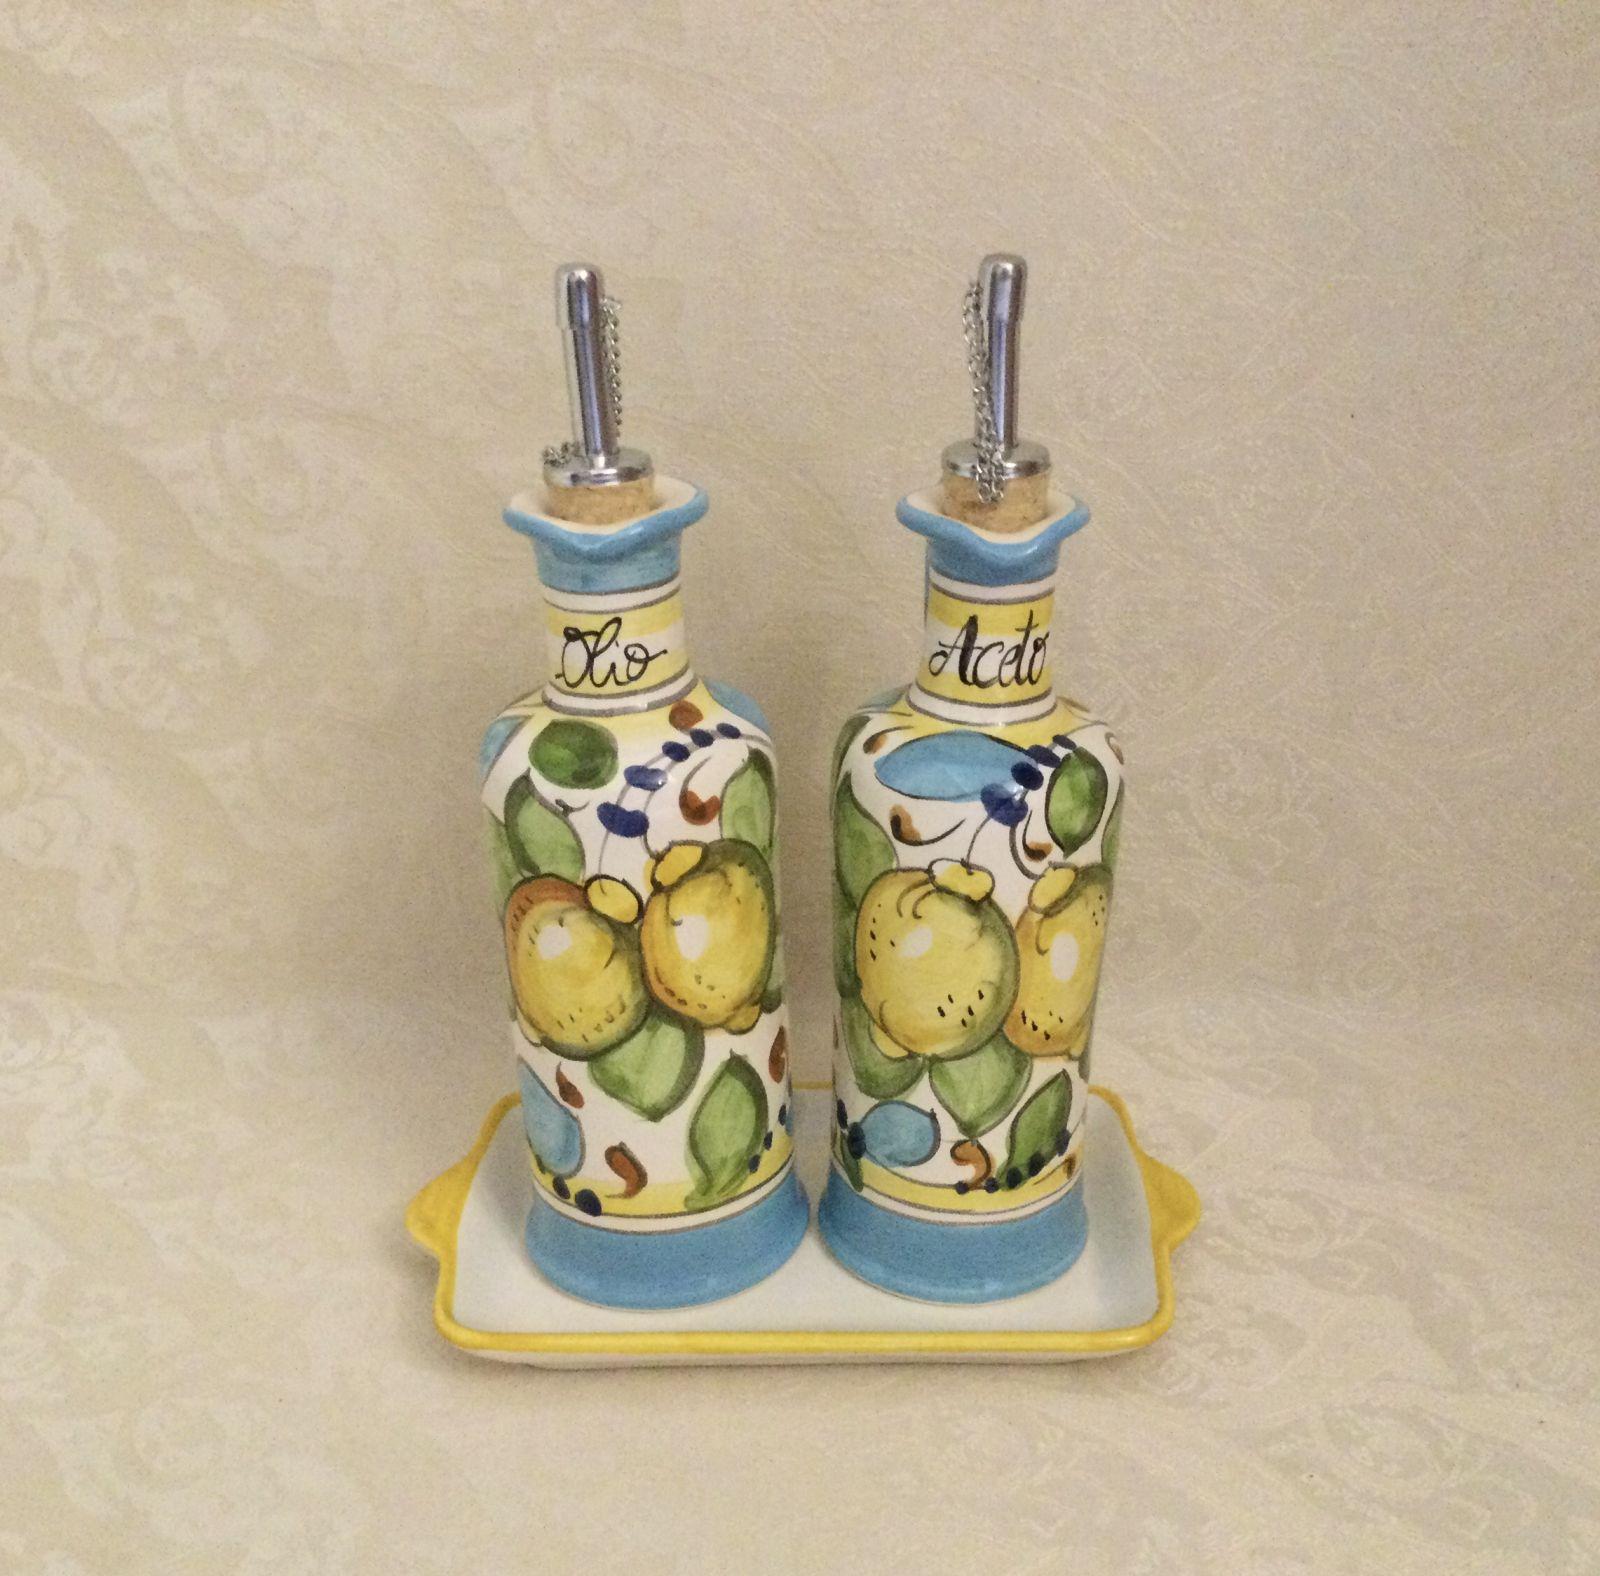 Set olio&aceto h18 limoni celesti